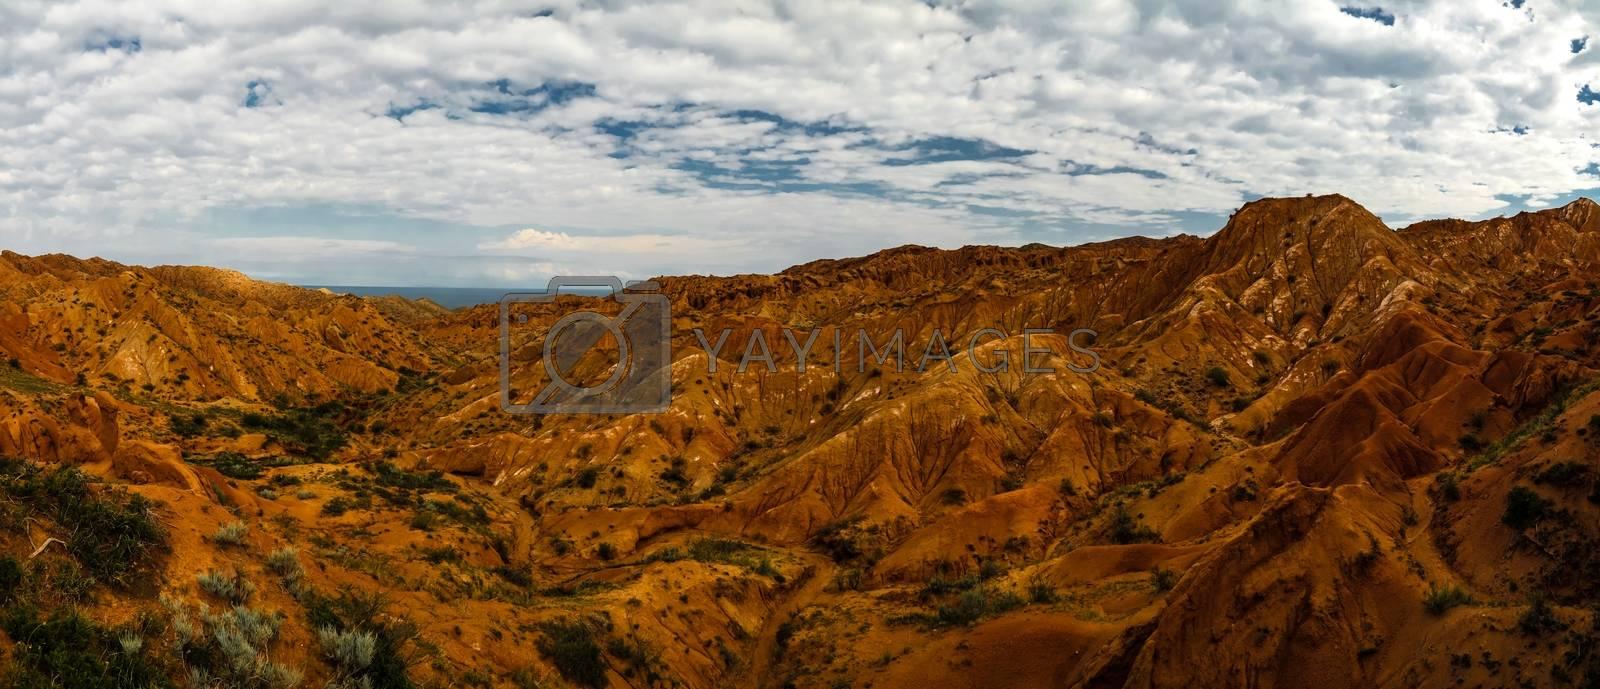 Panorama of Skazka aka Fairytale canyon, Issyk-Kul Kyrgyzstan by HomoCosmicos